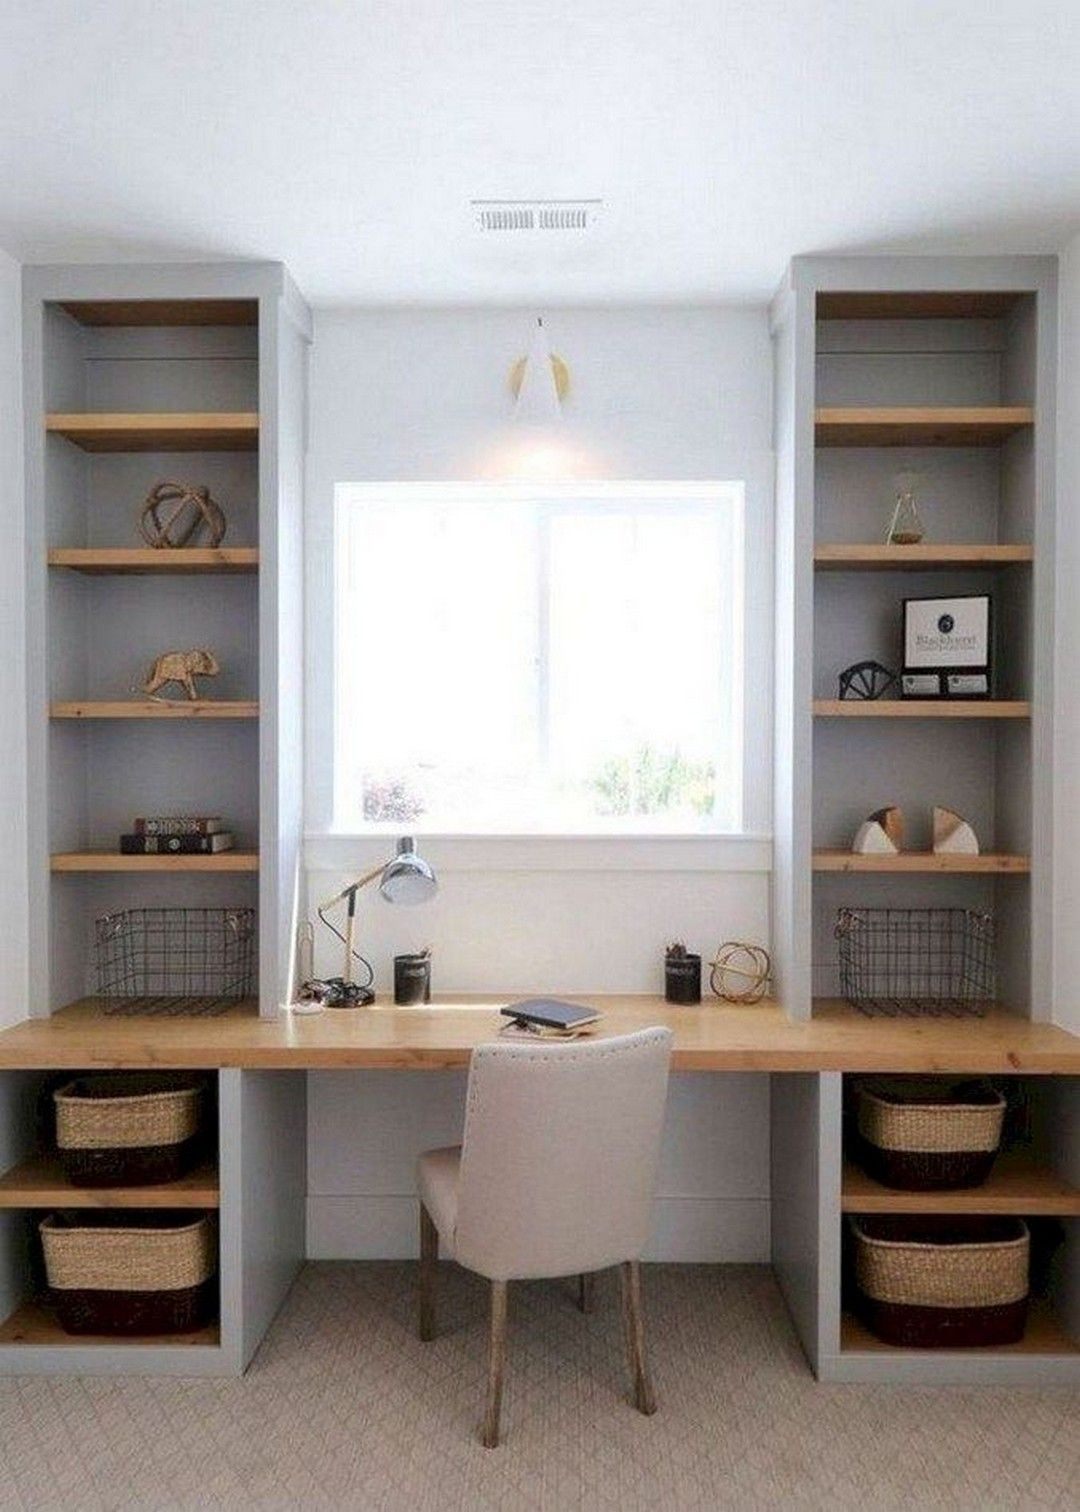 21 Bedroom Desk With Storage In 2020 Home Office Design Built In Desk Home Office Decor